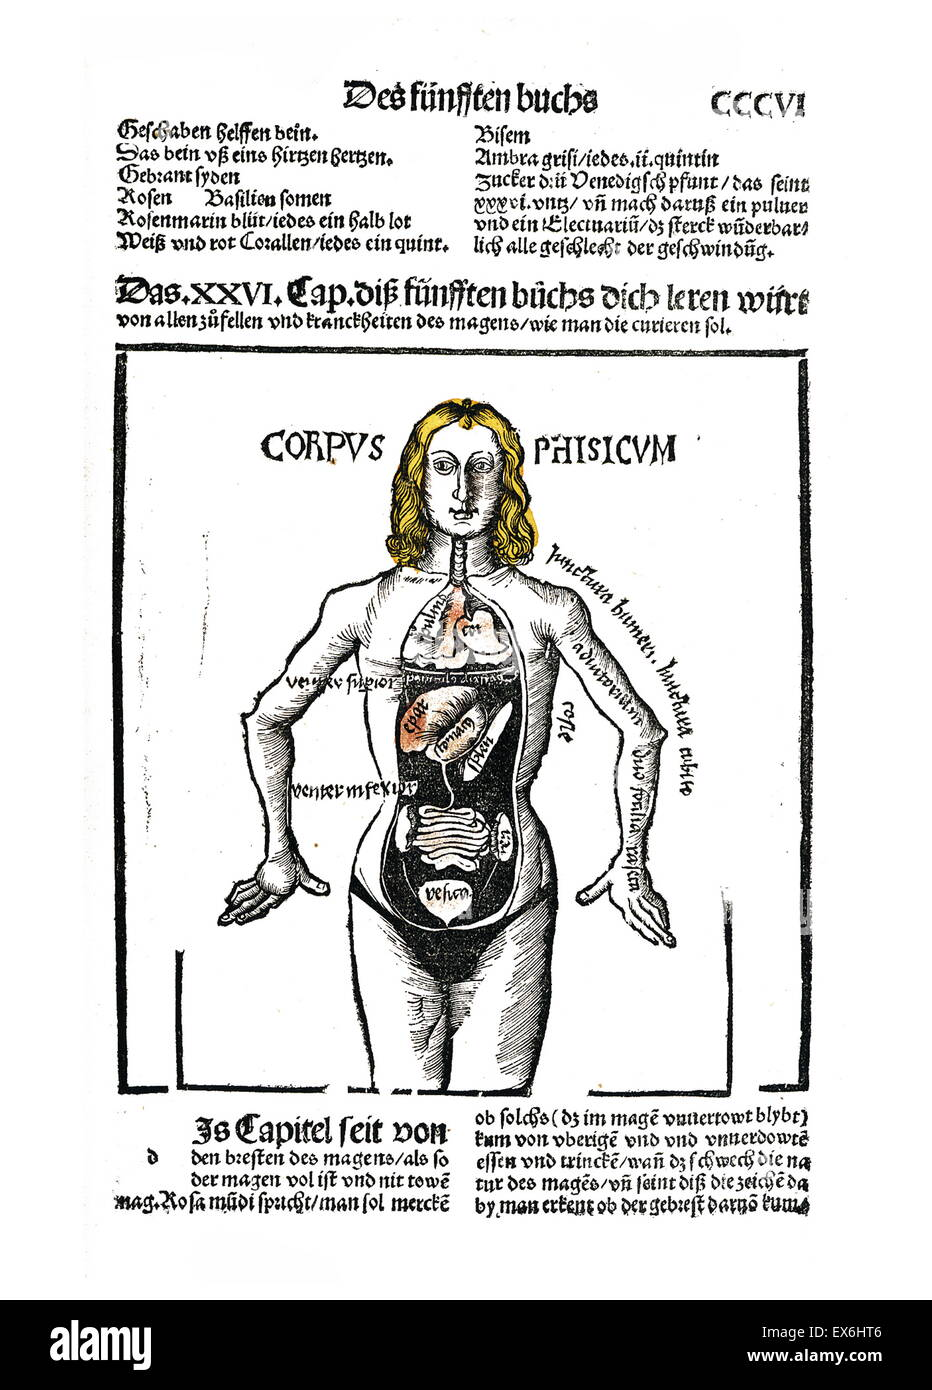 Anatomical woodcut from 'Liber de arte distillandi de compositis' by Hieronymus Brunschwig, 1450- 1512. - Stock Image